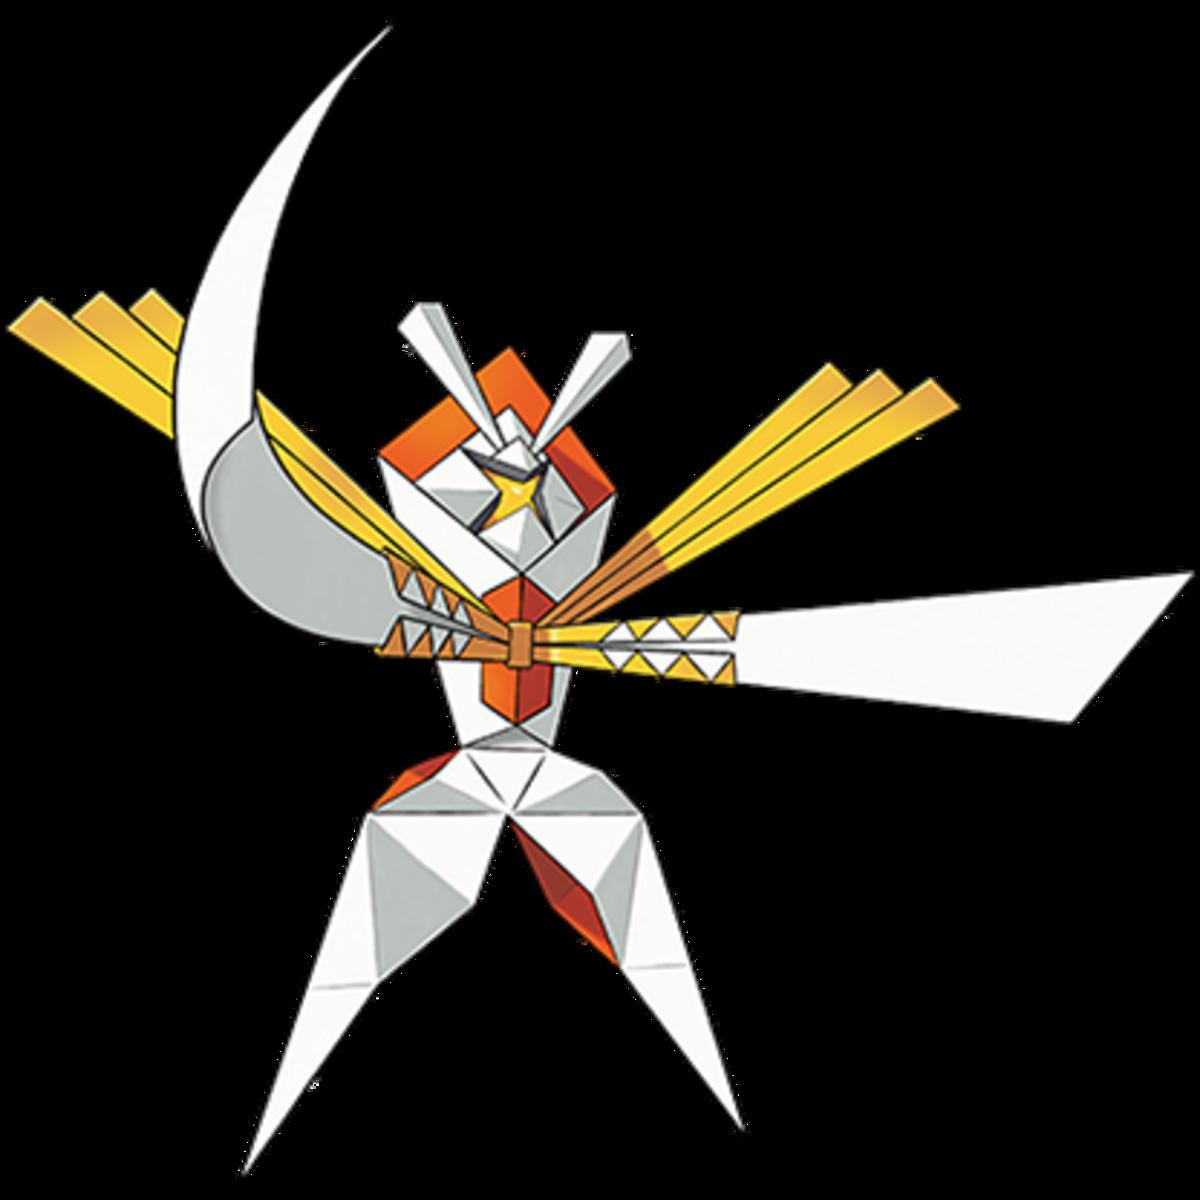 Kartana (UB-04 Blade)